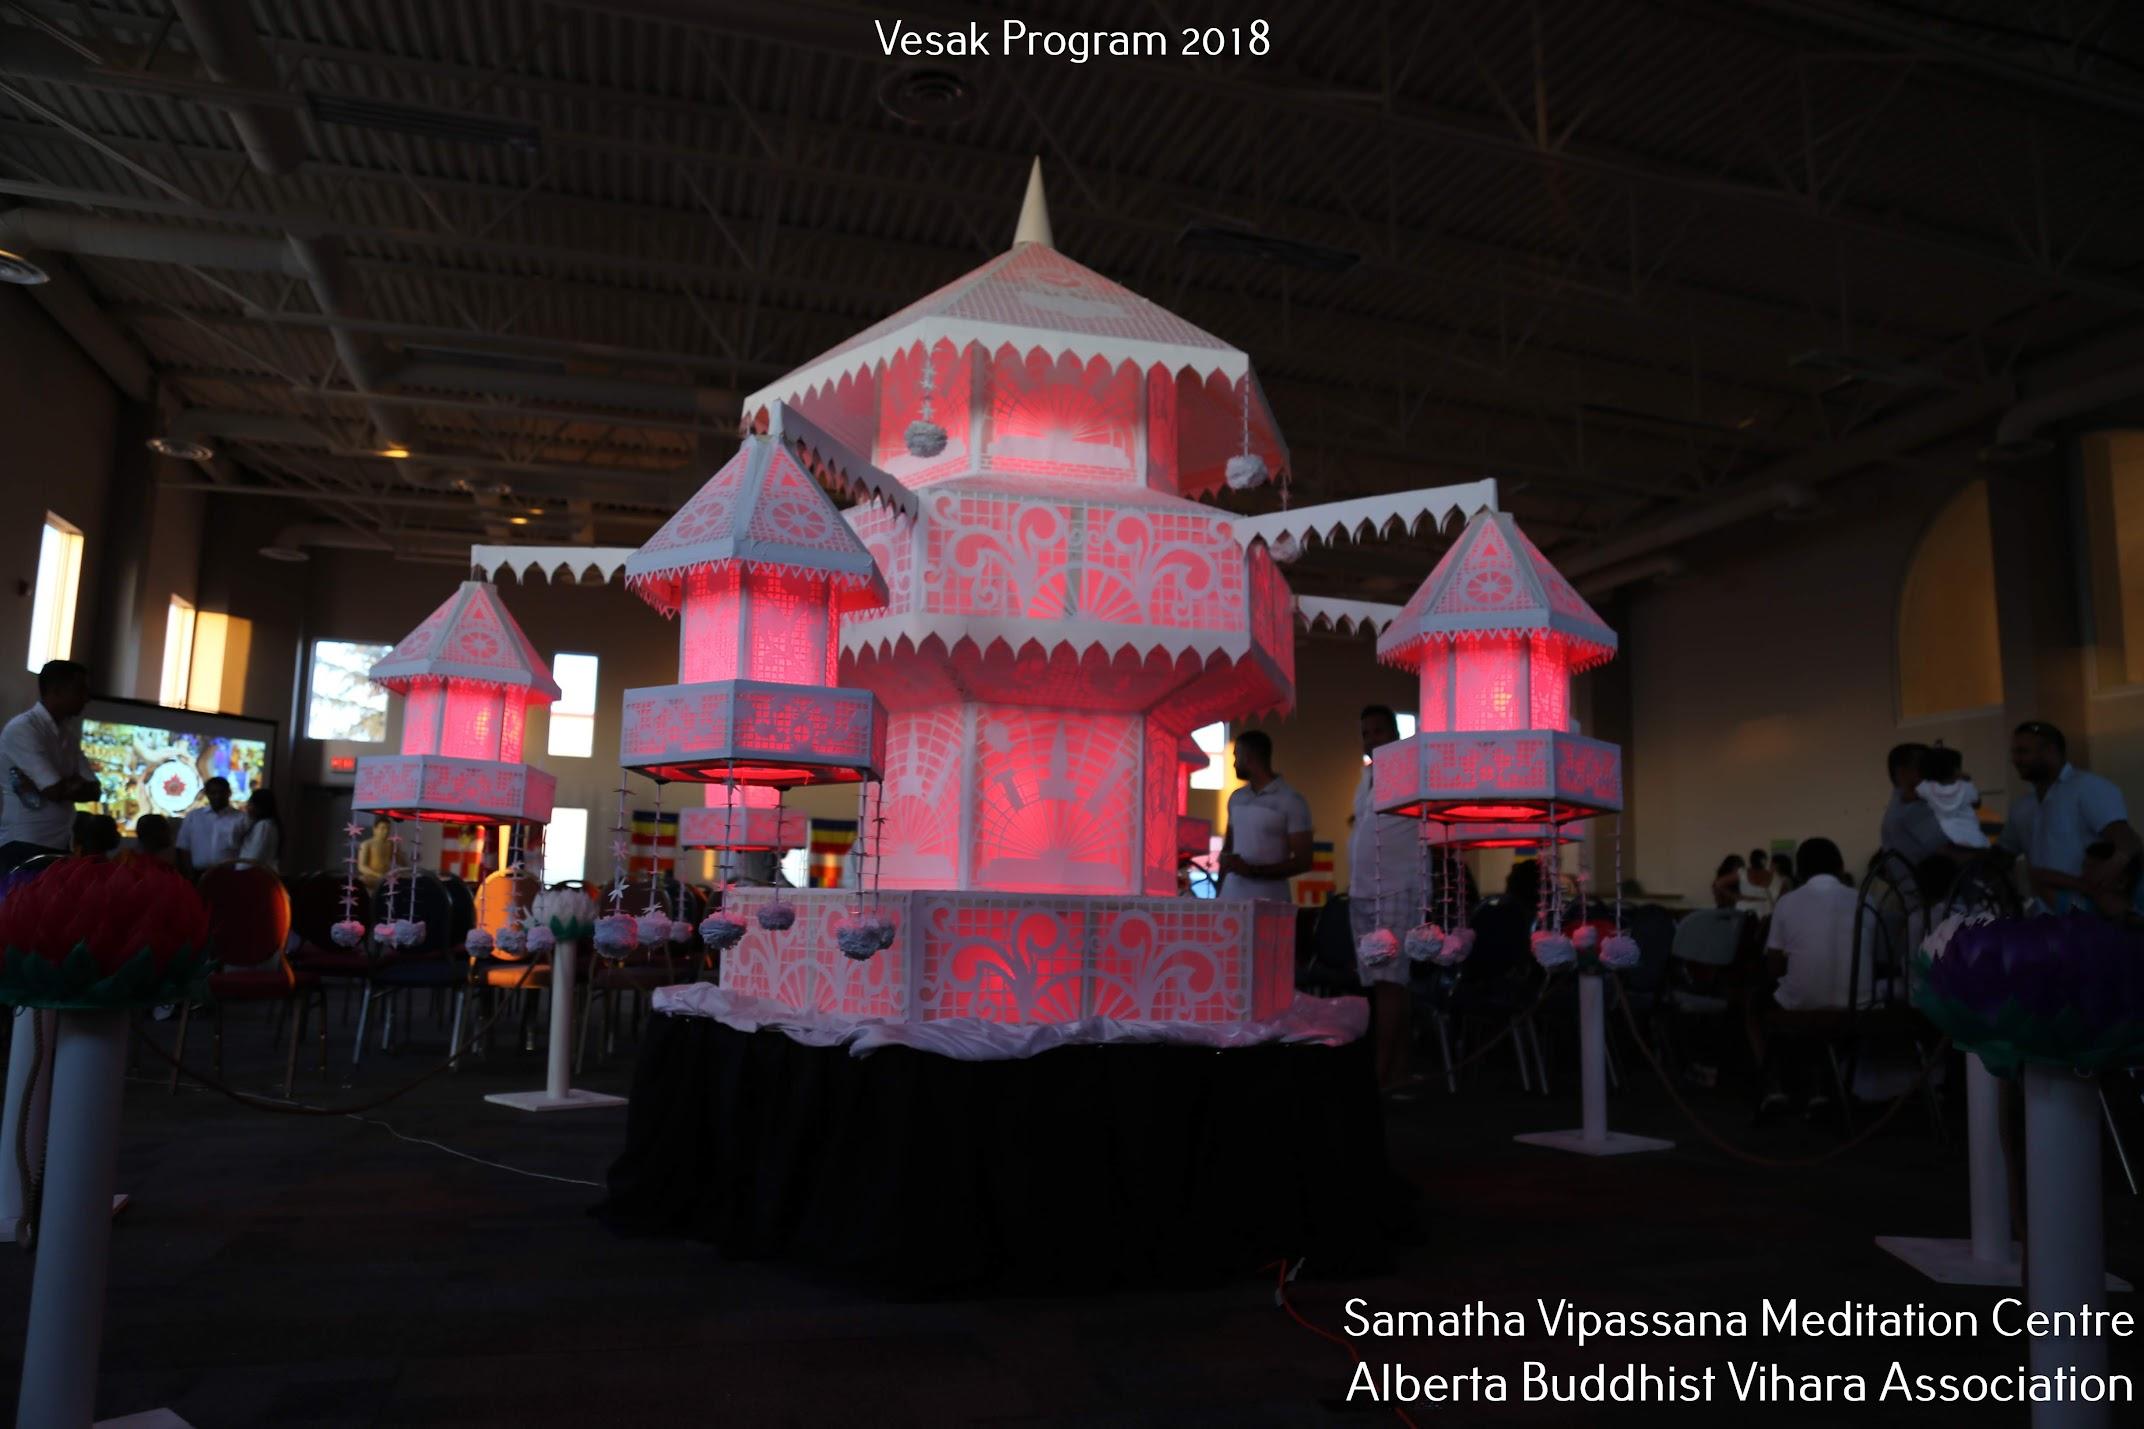 SVMC Vesak Festivities